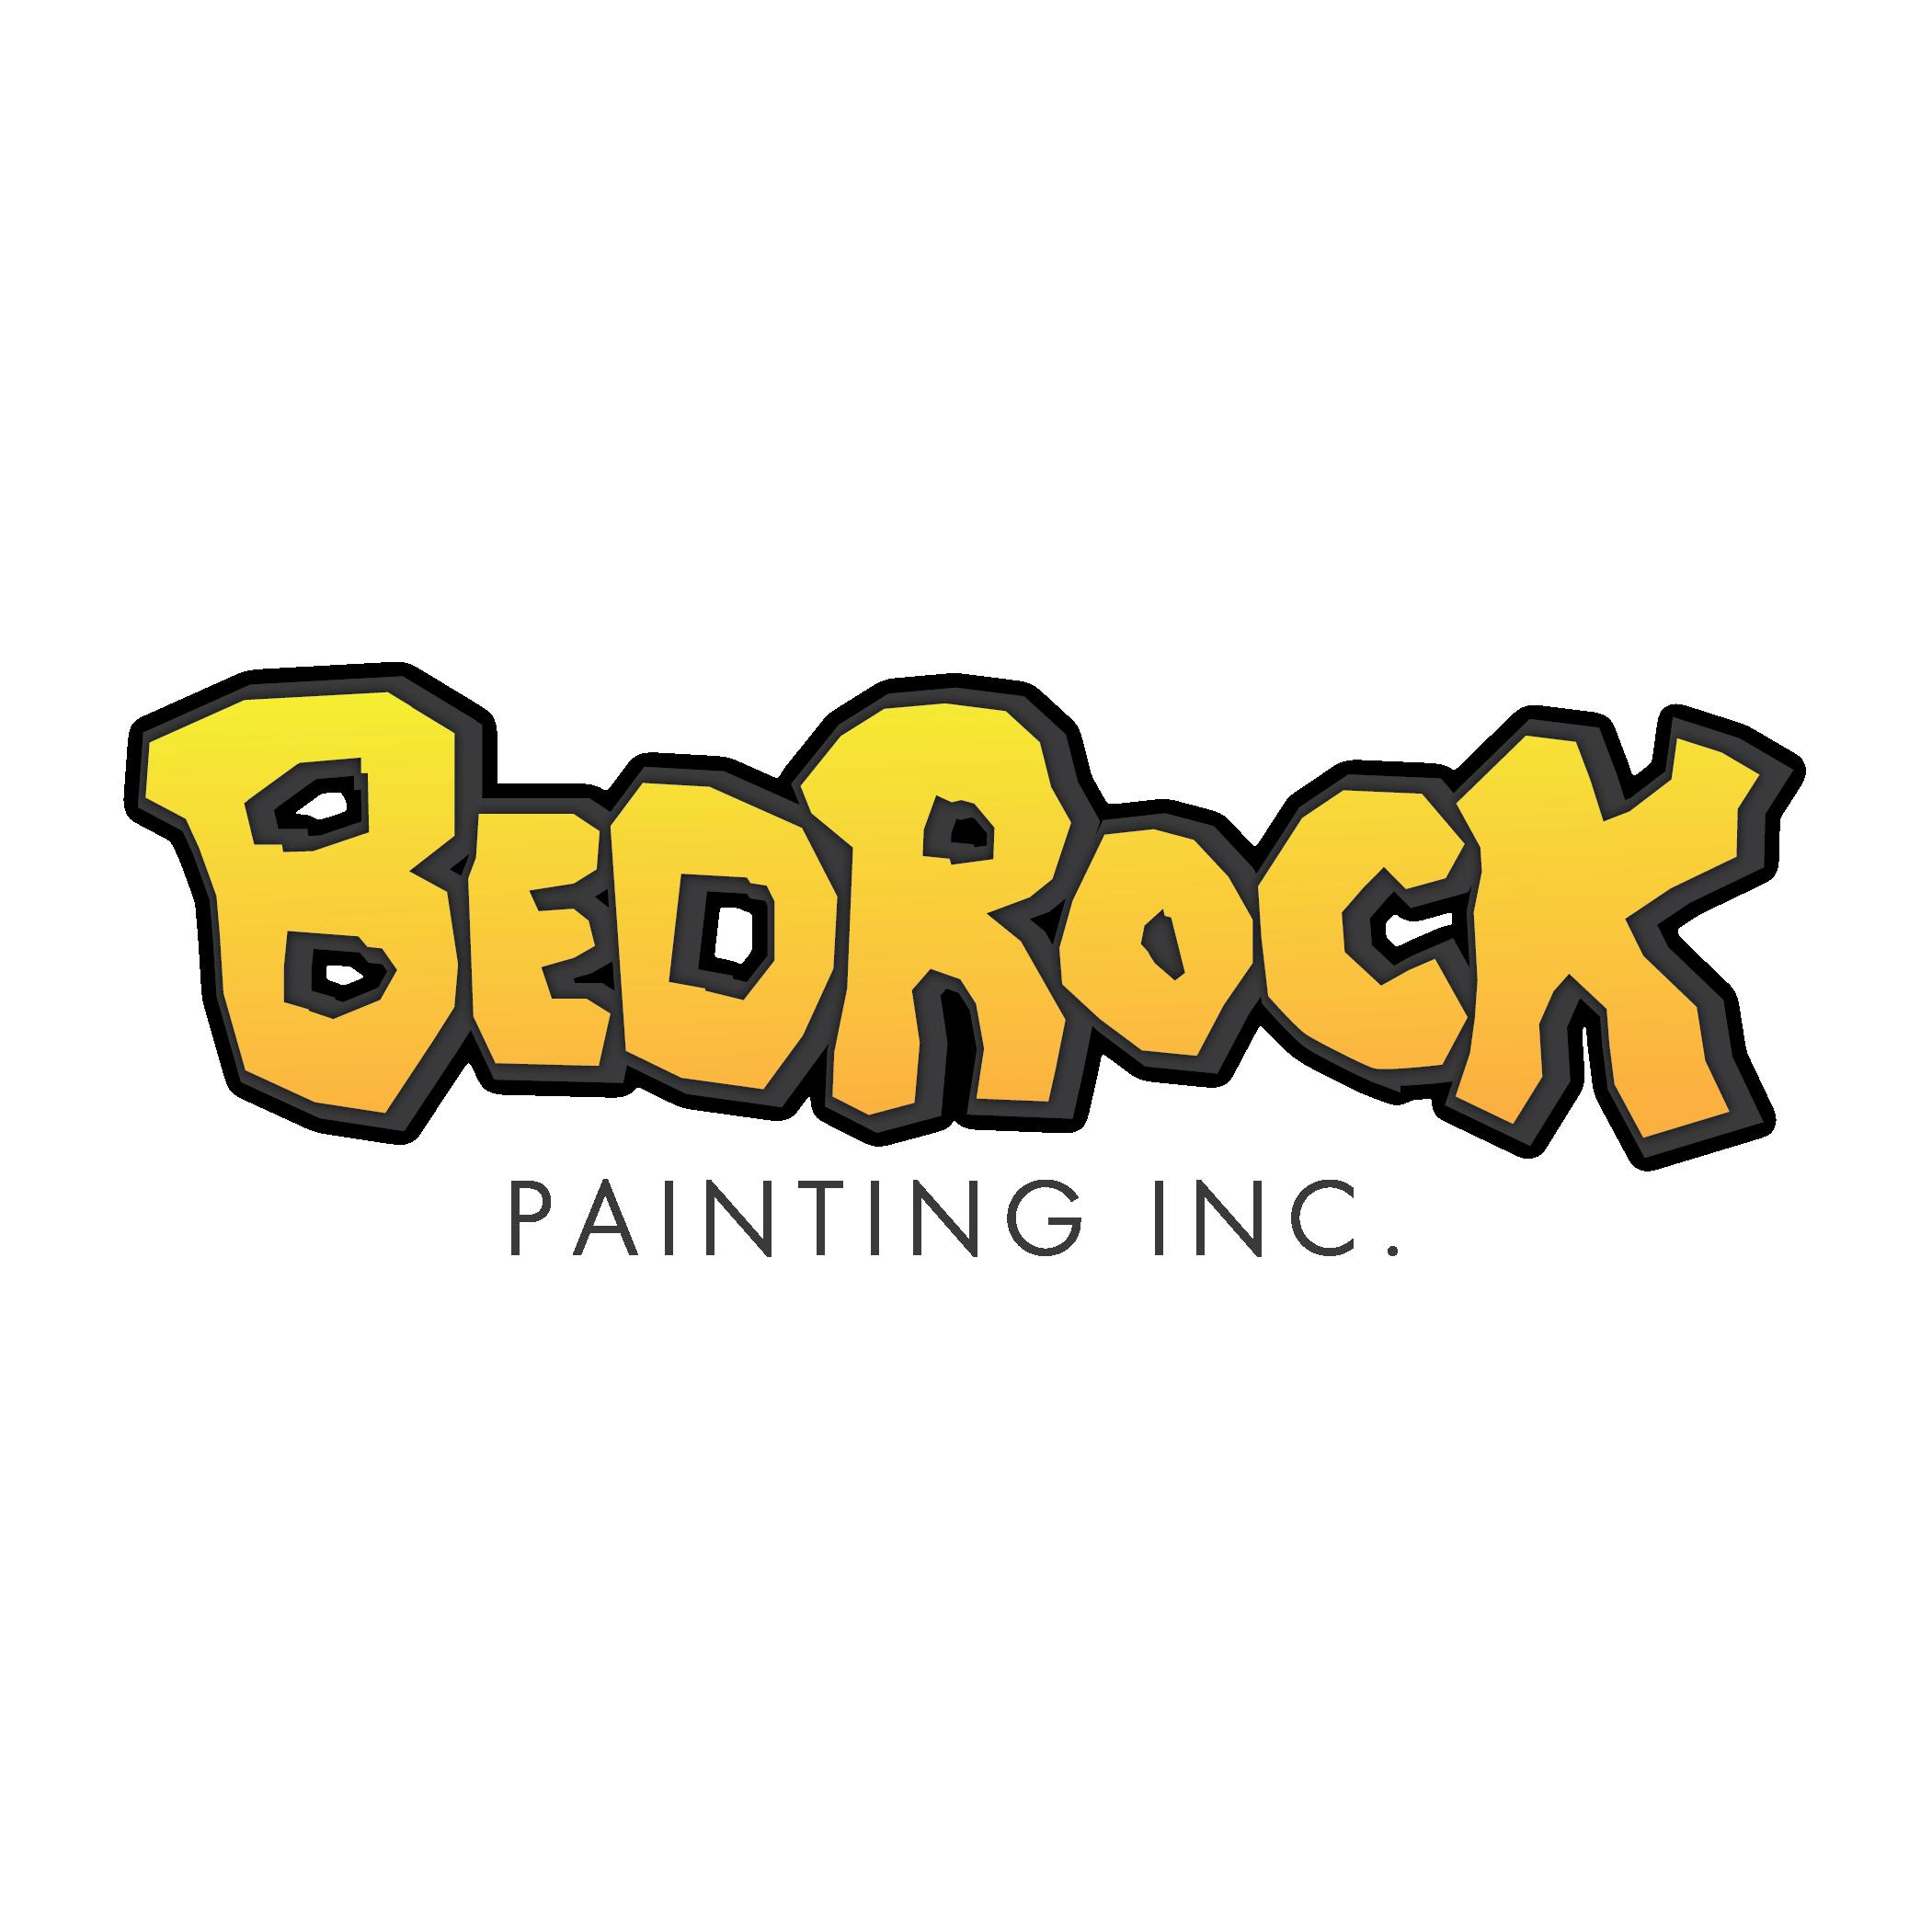 Bedrock Painting Inc.